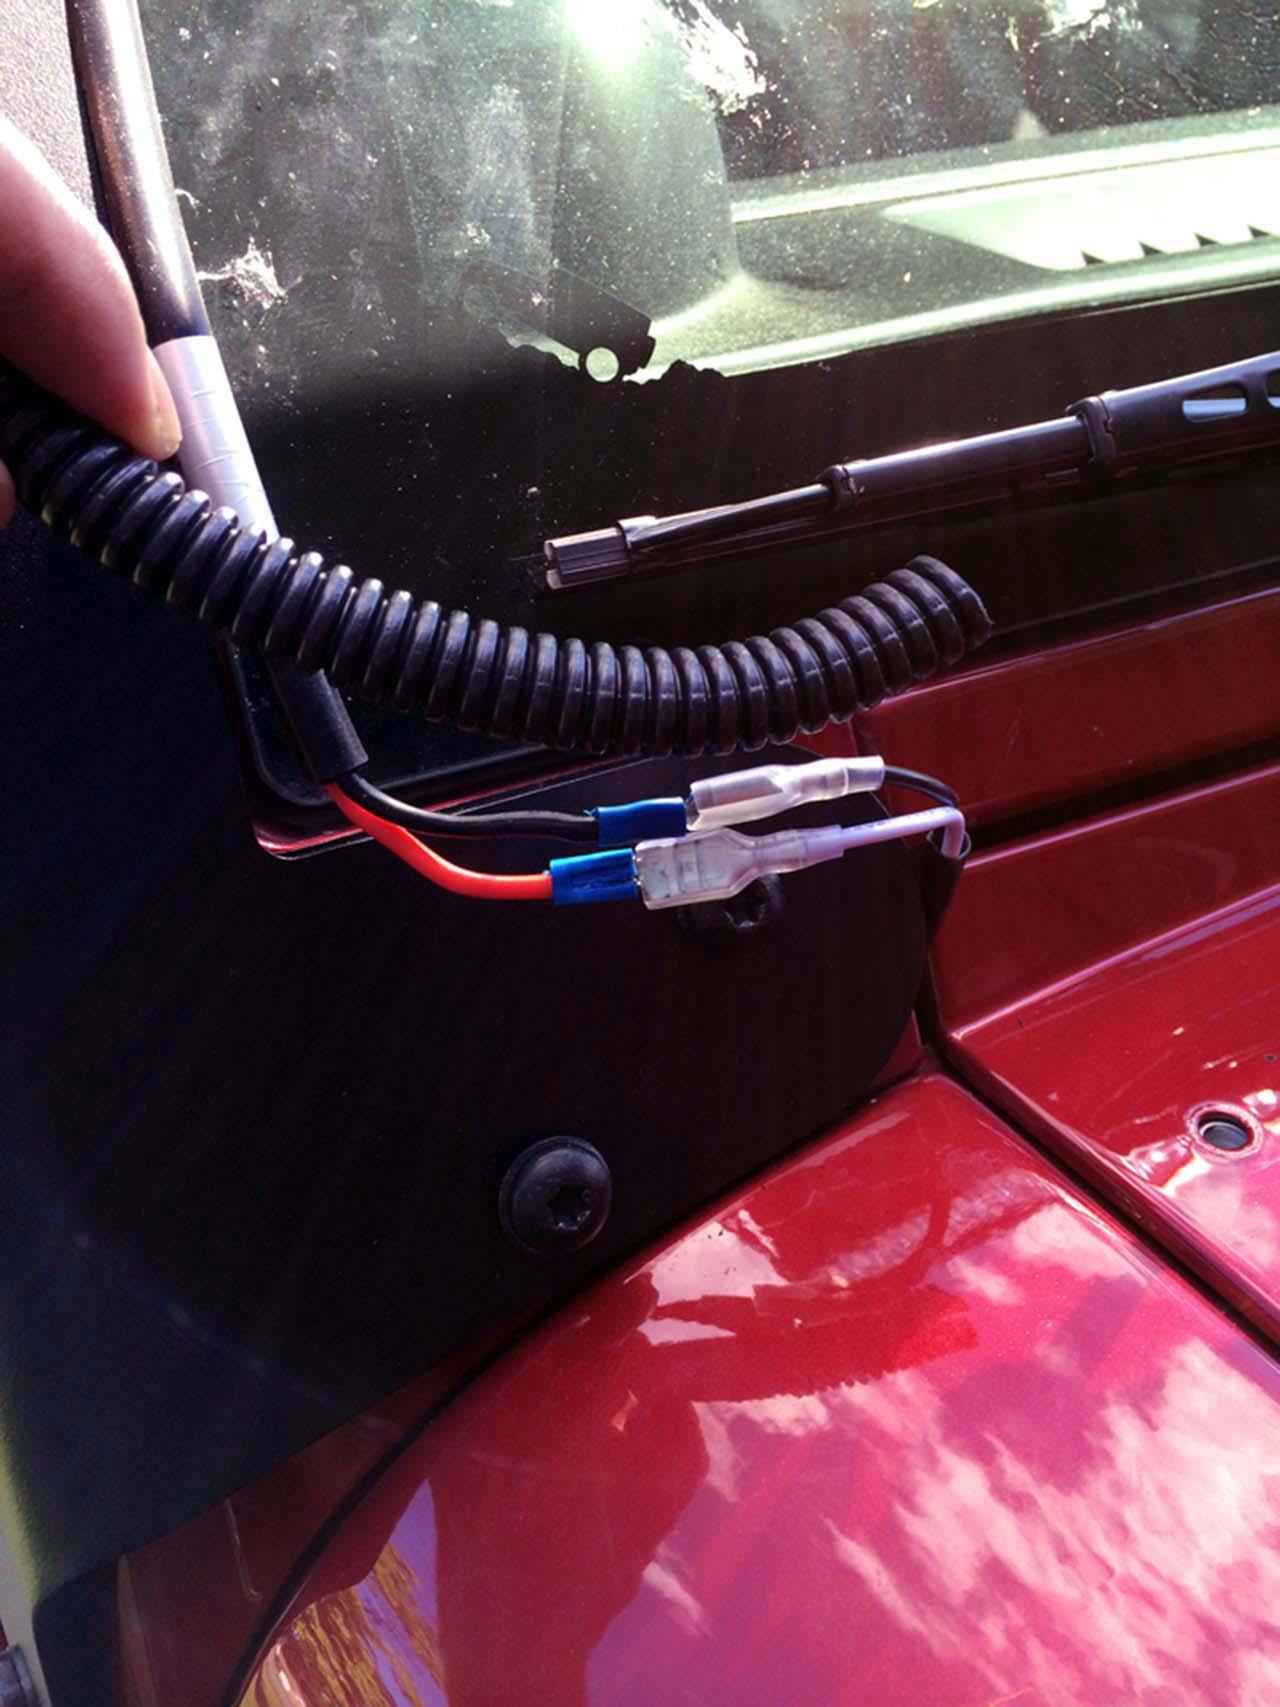 hight resolution of raxiom wrangler jk light bar installation wiring the harness wiring harness for jeep jk led light bar on wiring a light bar on jeep